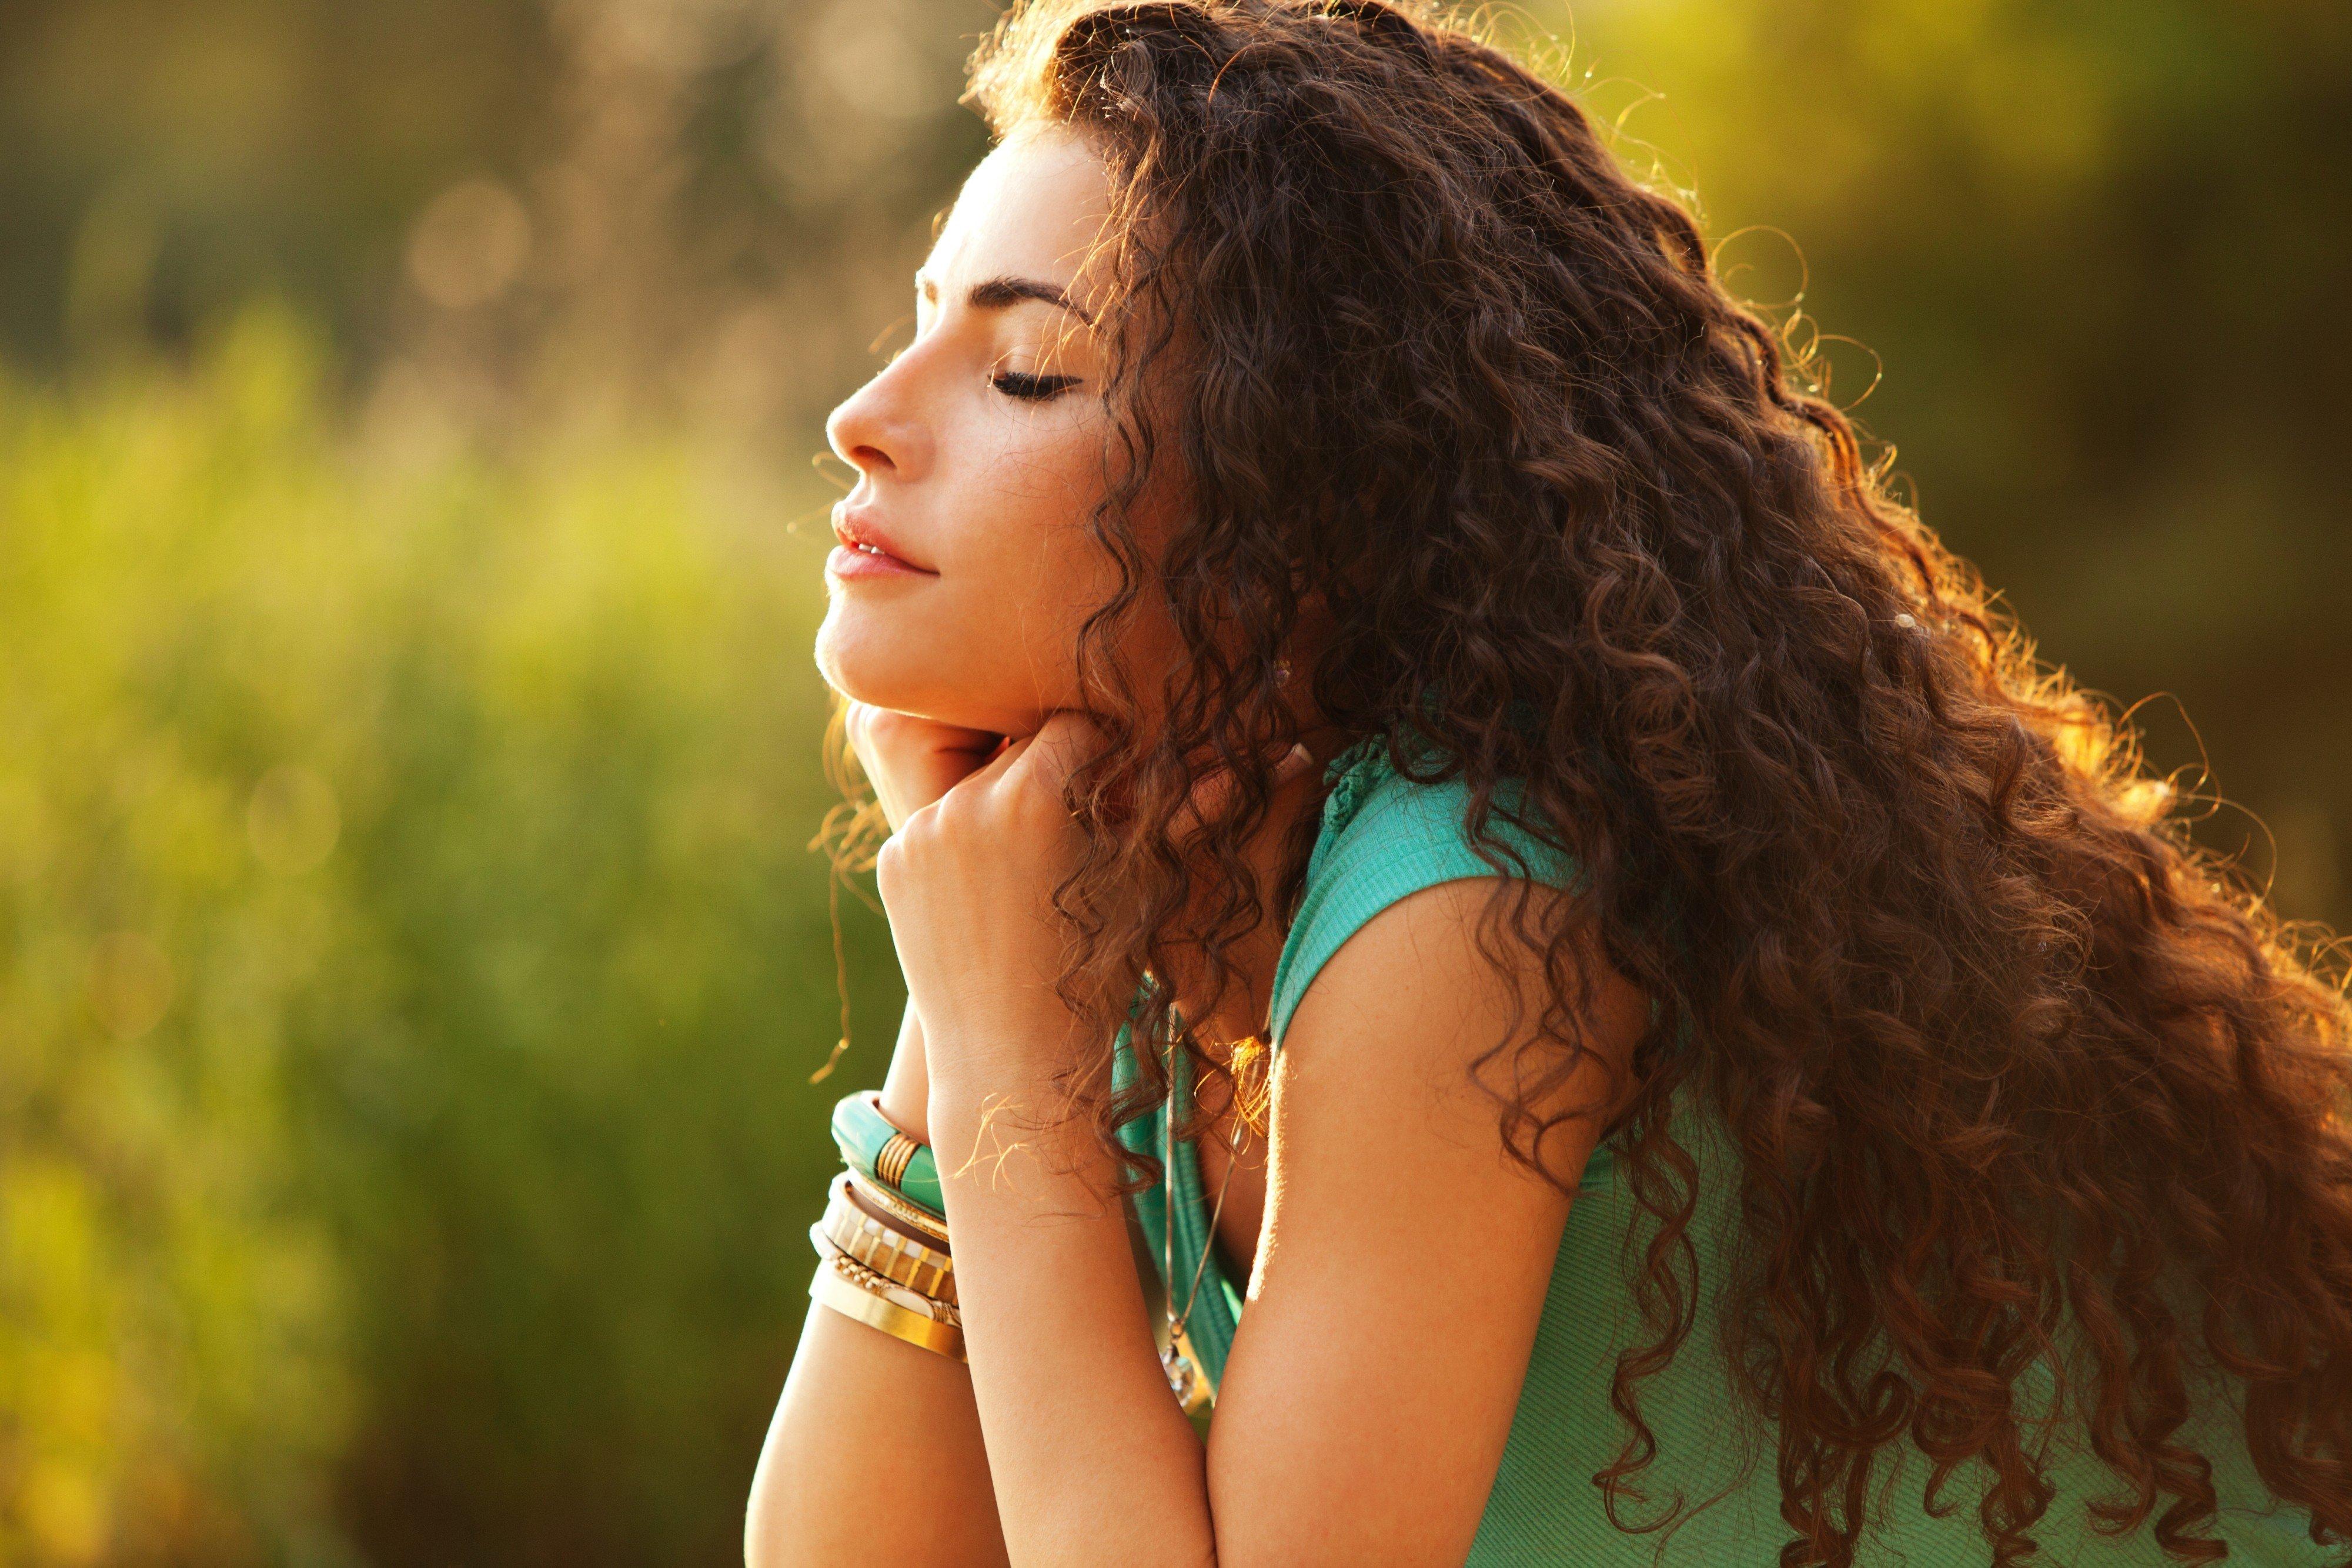 women, Model, Brunette, Long hair, Women outdoors, Hair in